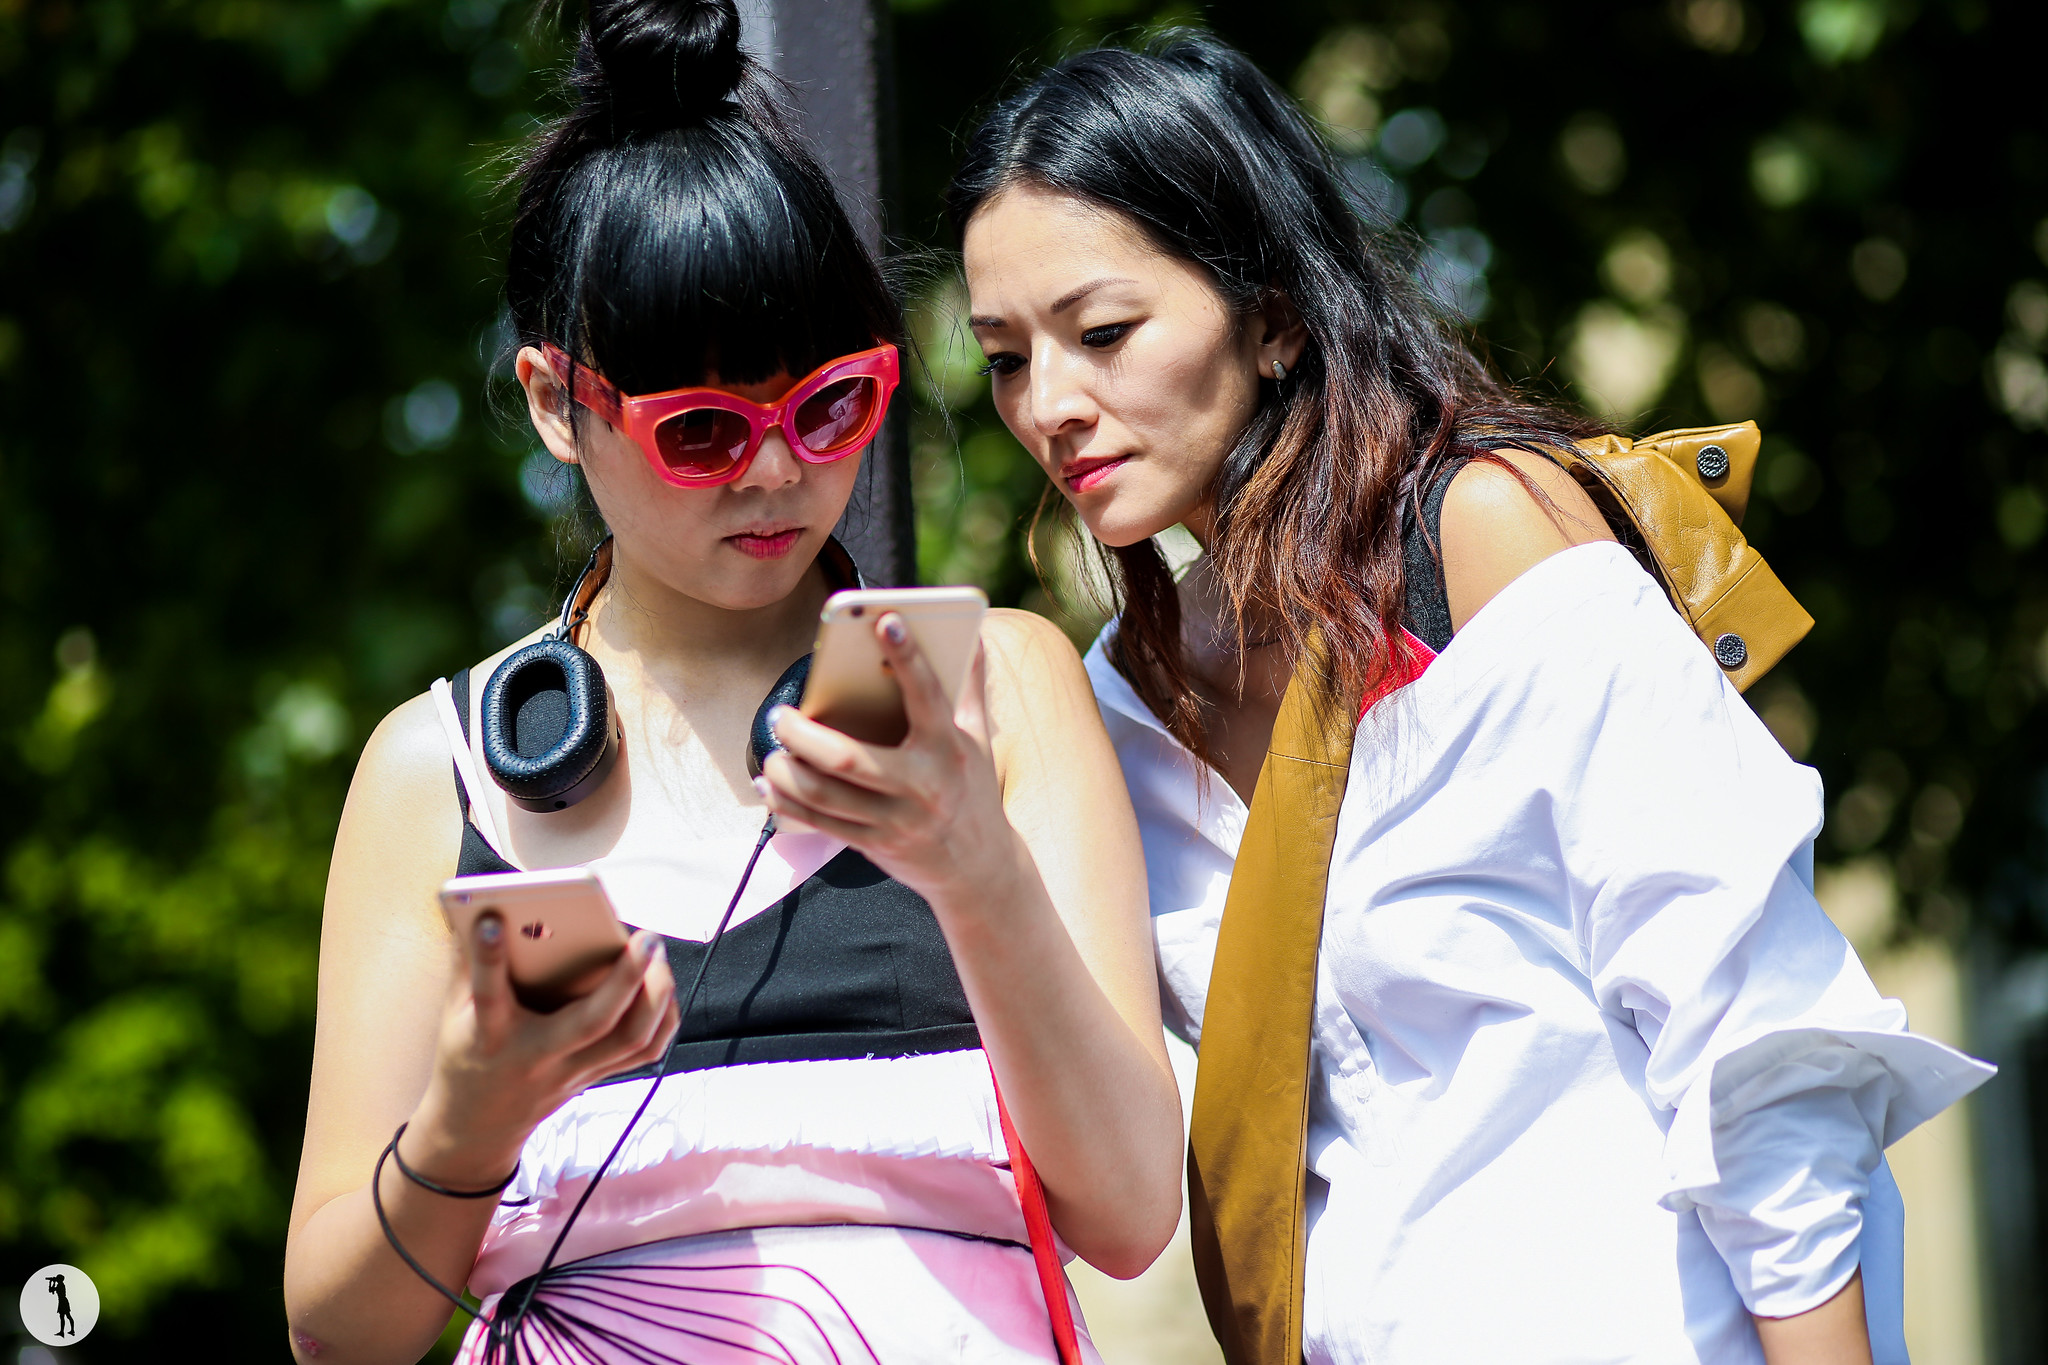 Susie Lau and Tina Leung at Paris Fashion Week Haute Courure